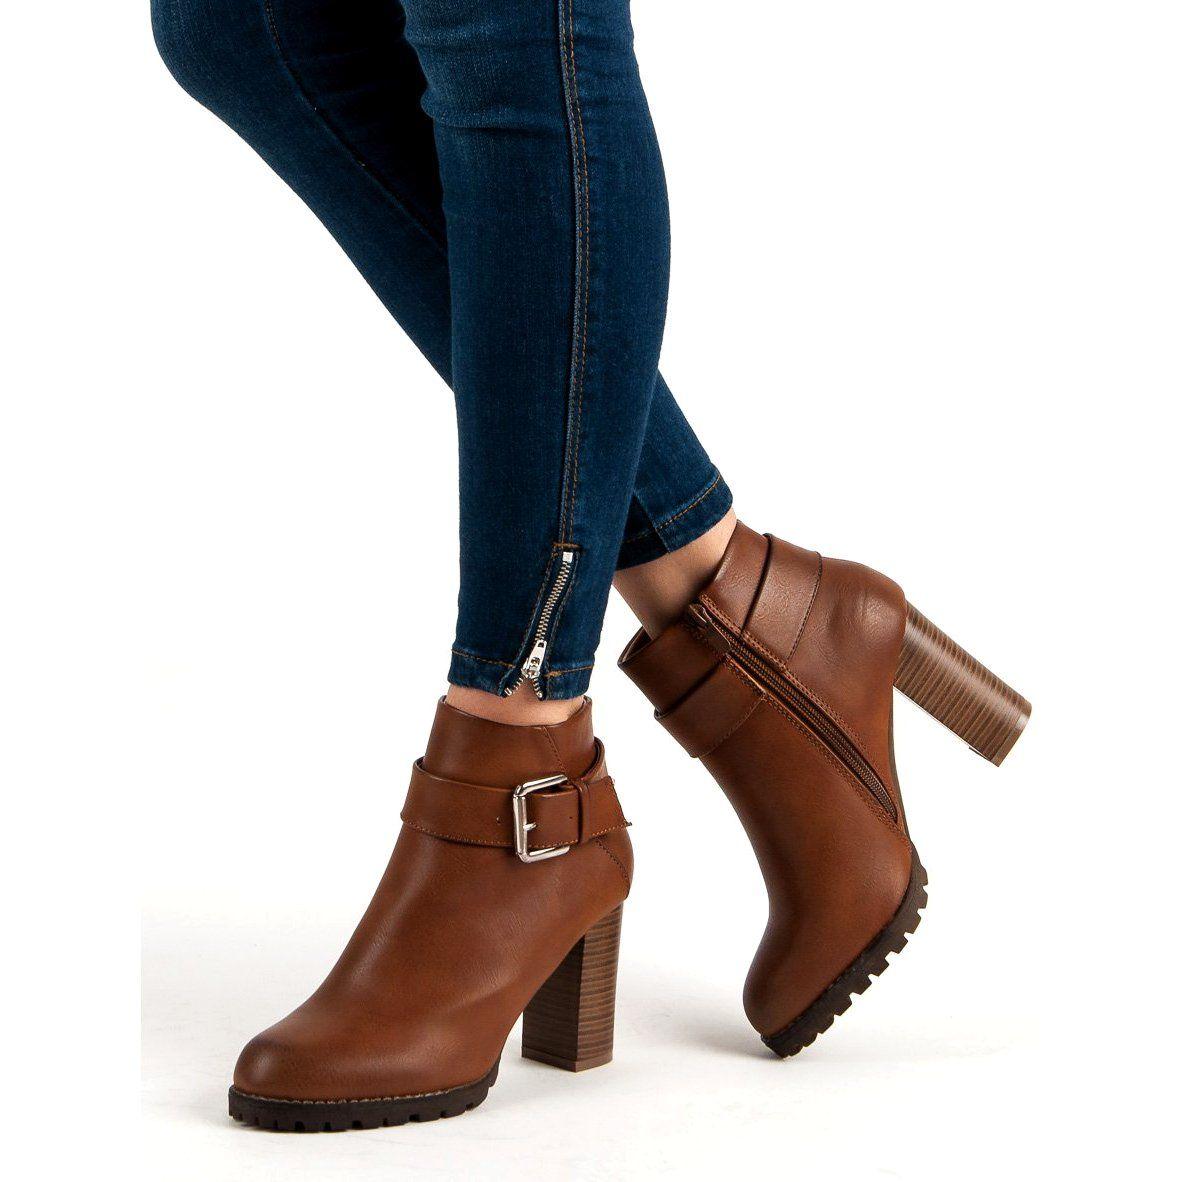 Super Mode Camelowe Botki Na Slupku Brazowe Ankle Boot Shoes Boots